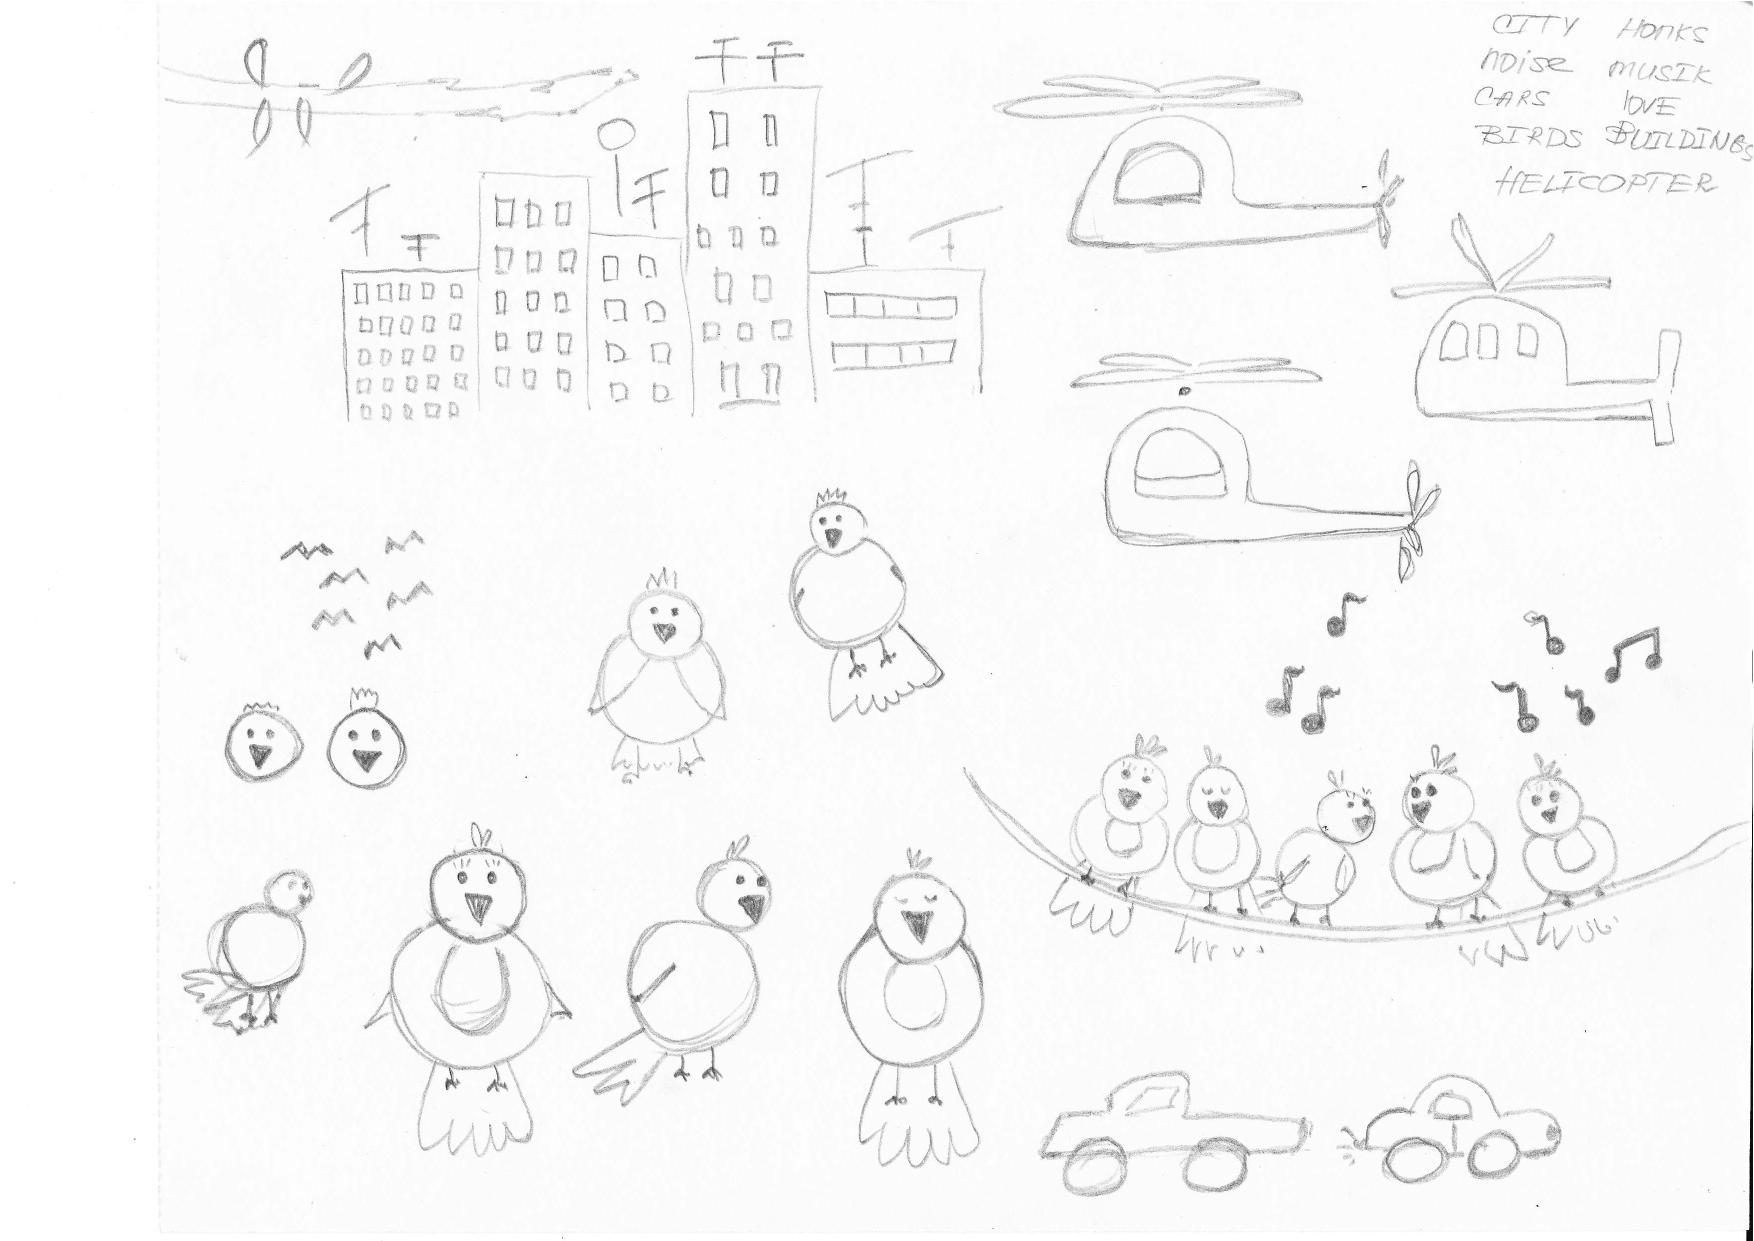 'Noisy birds' sketch - image 1 - student project